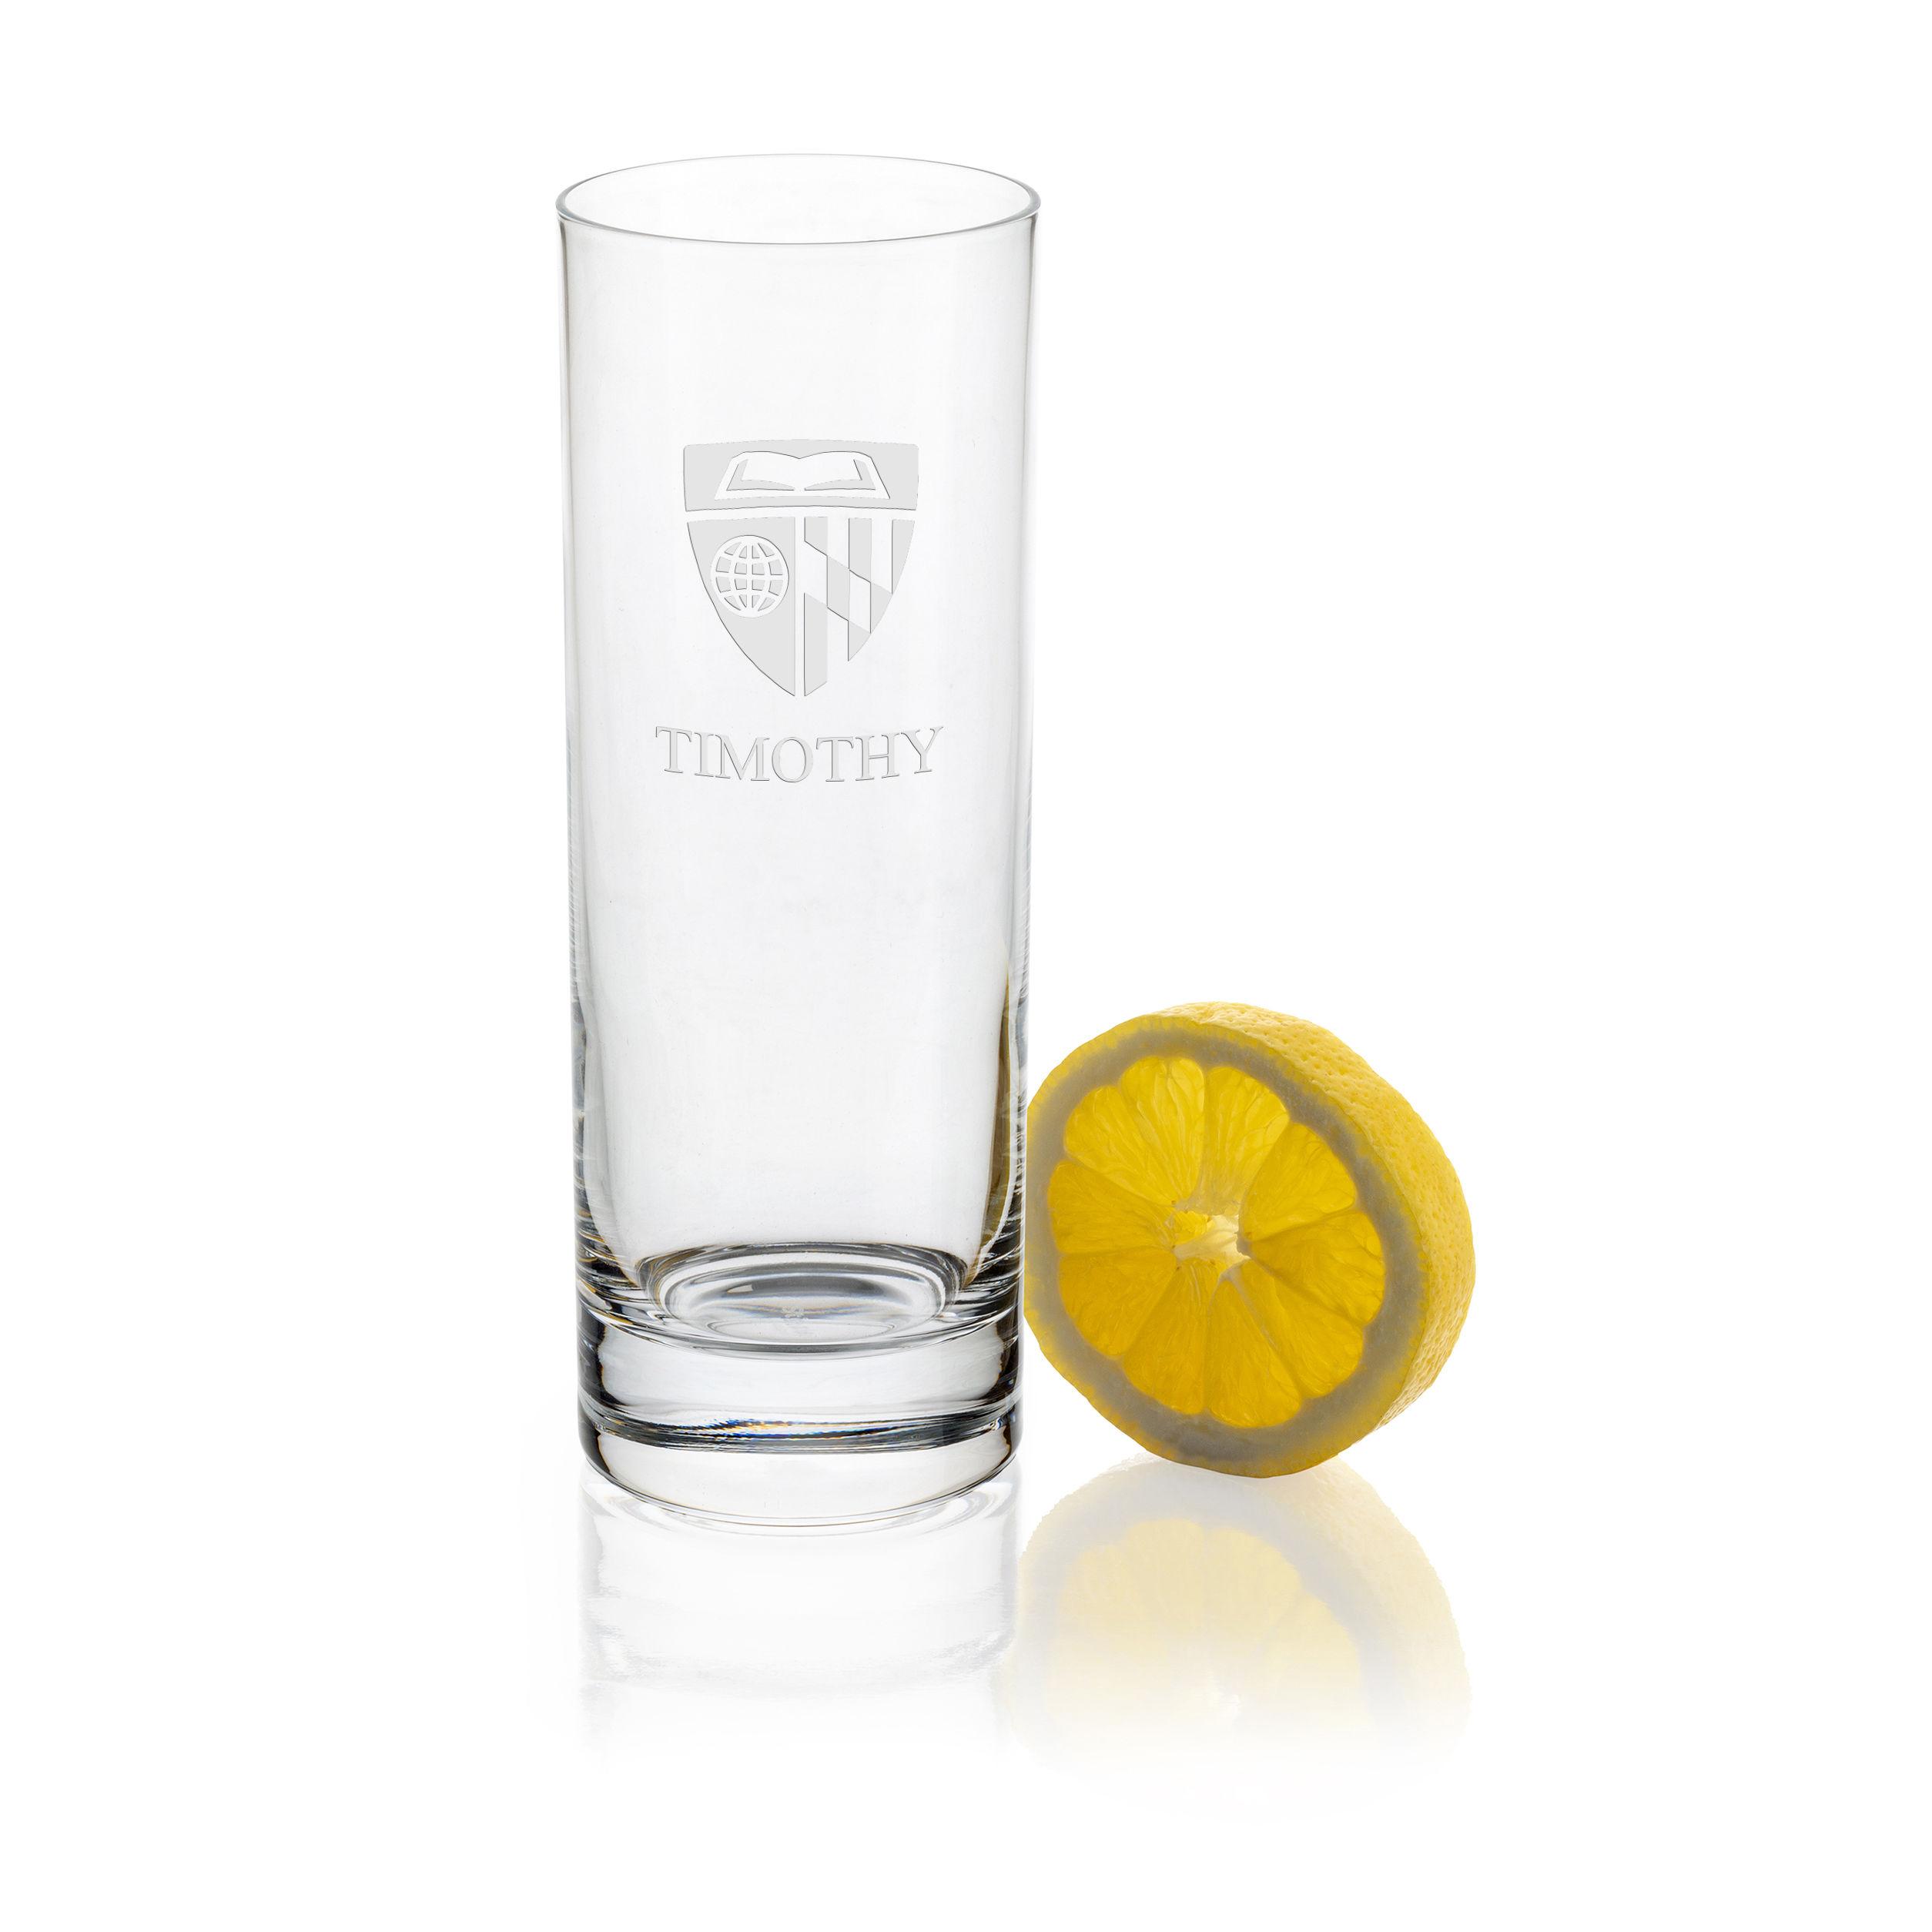 Johns Hopkins University Iced Beverage Glasses - Set of 4